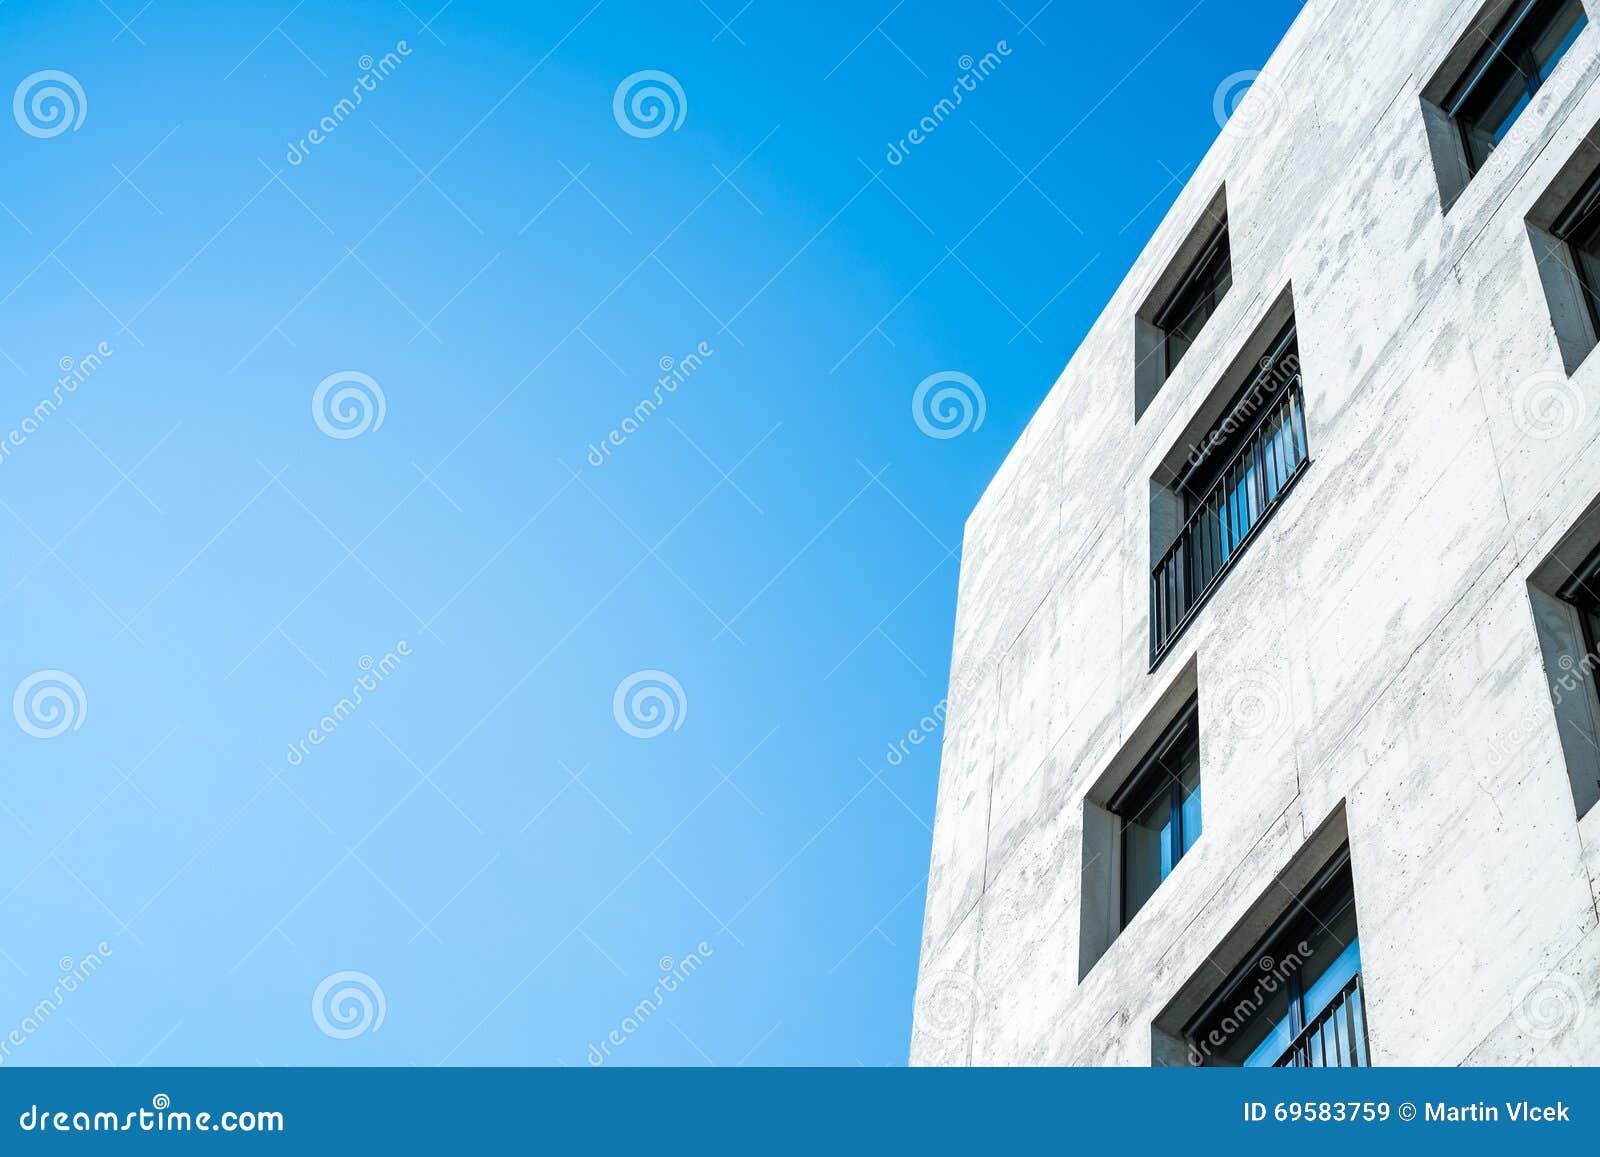 Concrete Building With Windows : Concrete facade of a building with windows stock